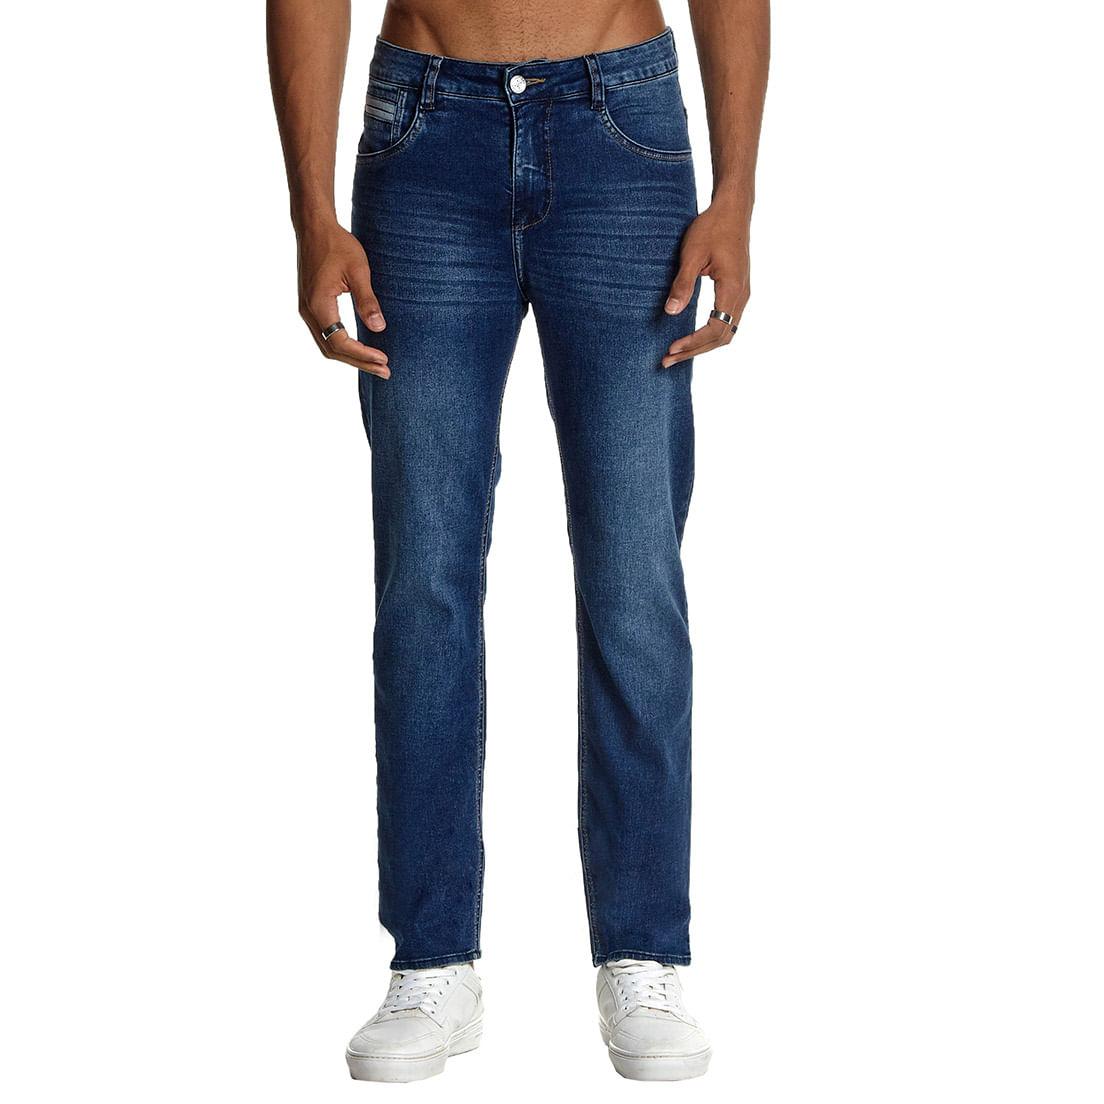 Calça Jeans Osmoze Slim 101124315 Azul